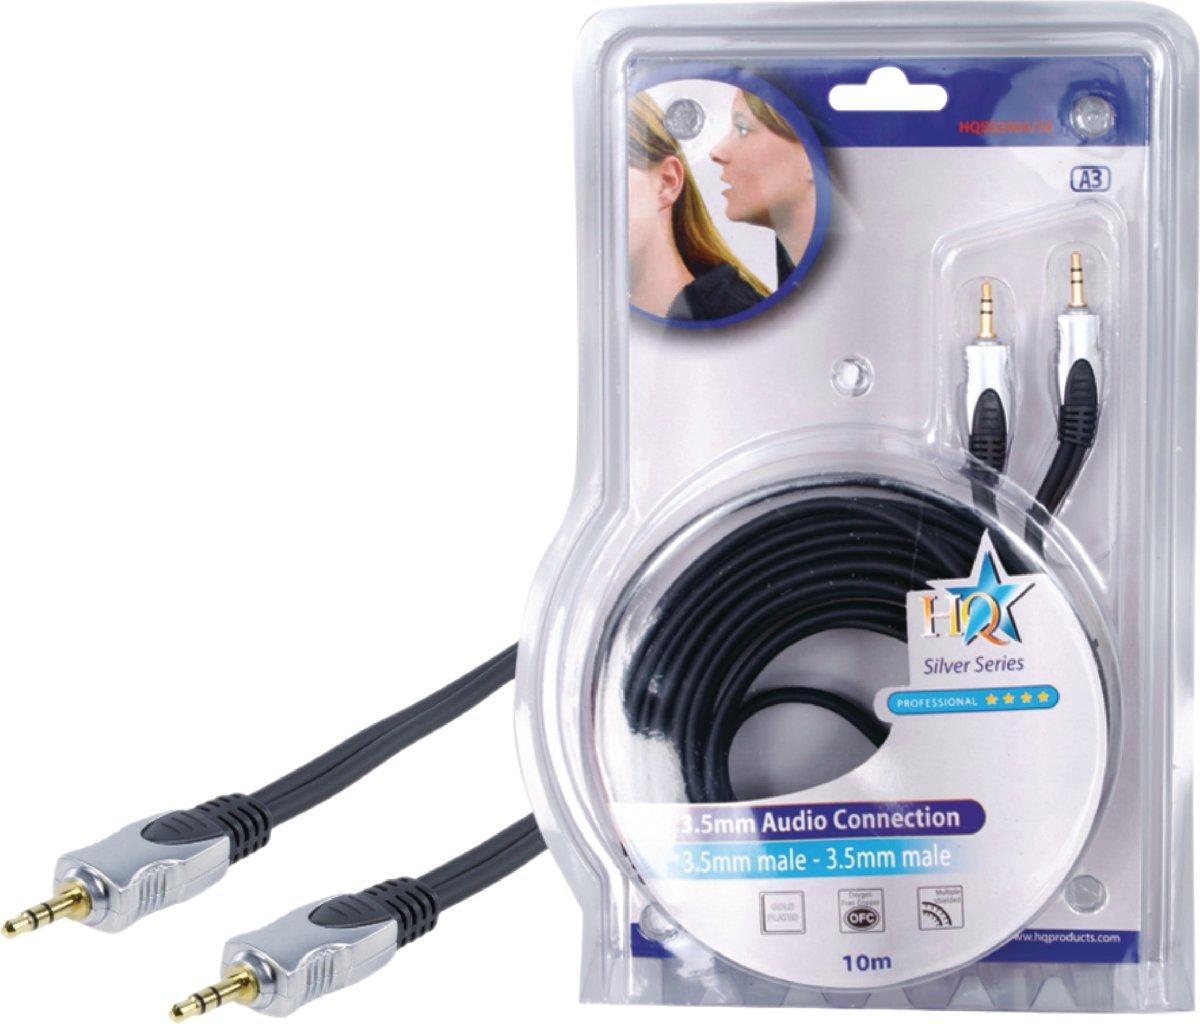 HQ, Hoge Kwaliteit Audio Kabel 10m kopen